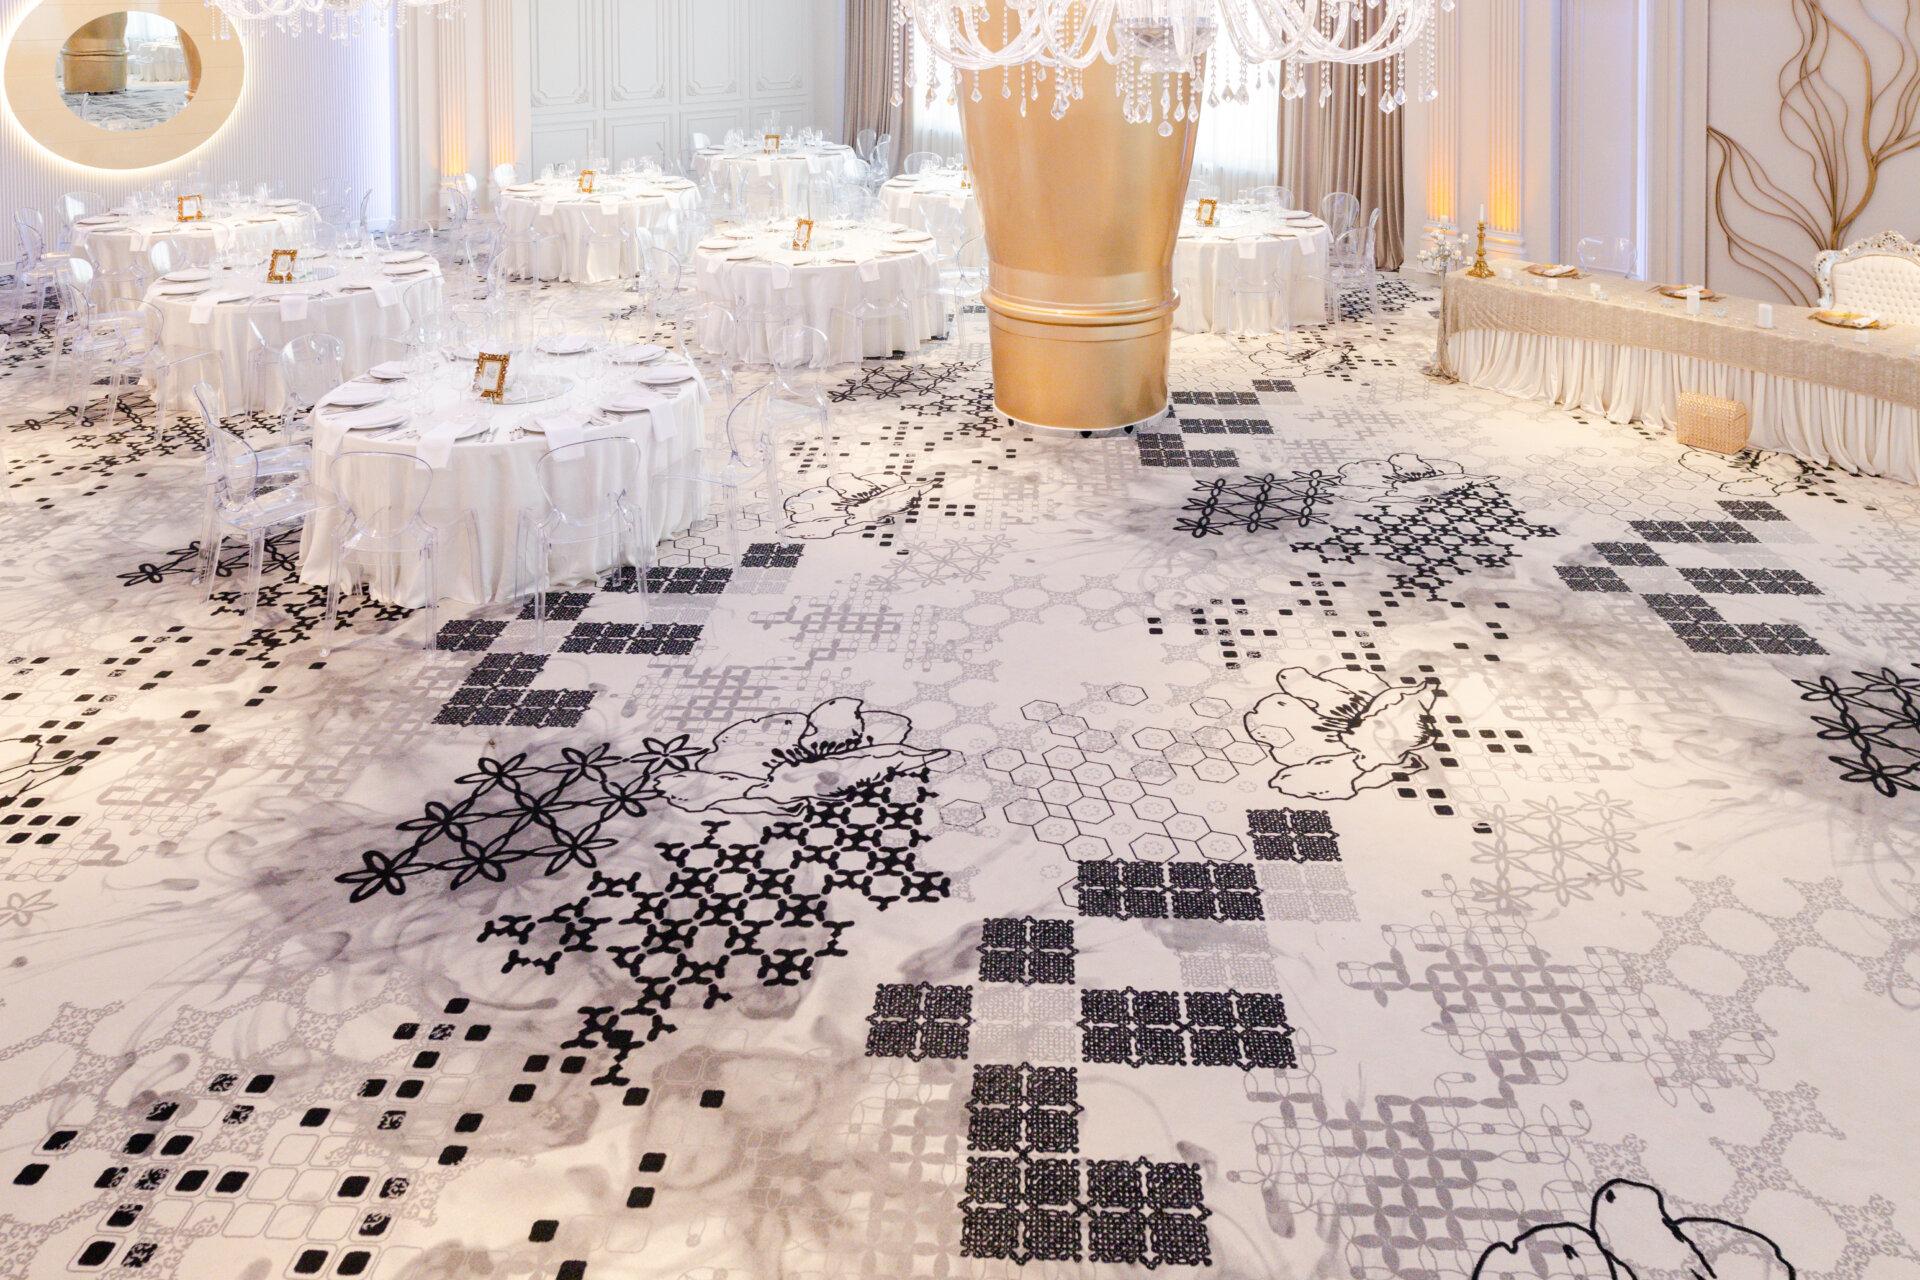 20210303-carpet&more-hotel-rocca-craiovaby-hugmedia-35